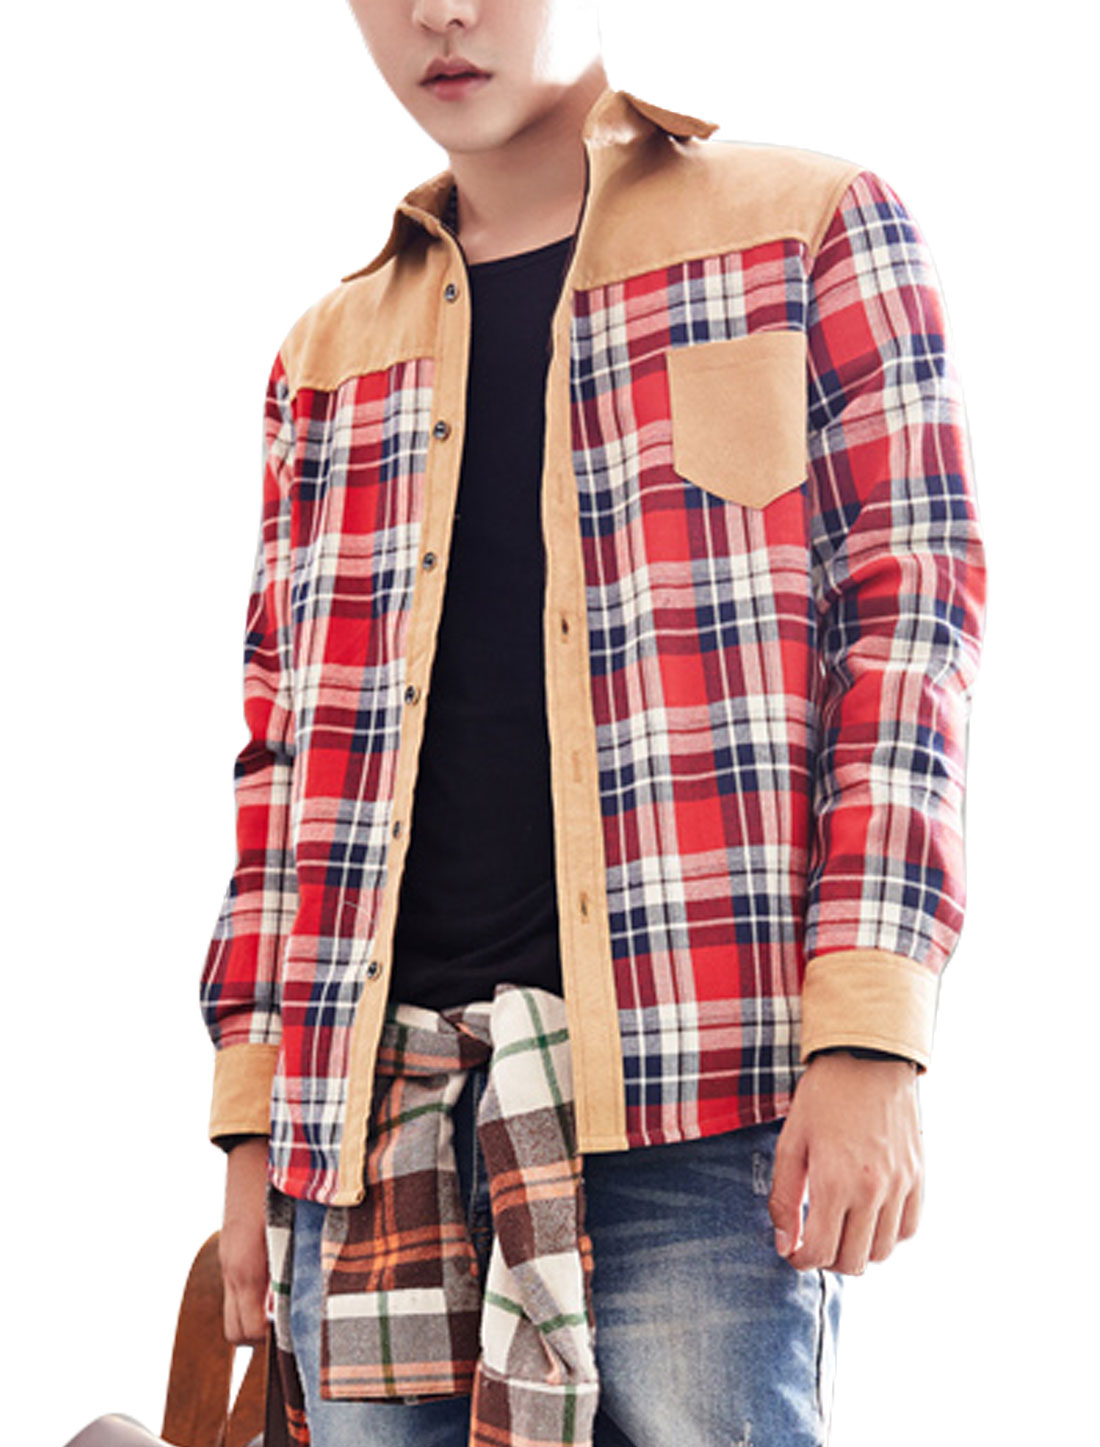 Men Red Khaki Single Breasted Checks Prints Lining Button Cuffs Casual Shirt M